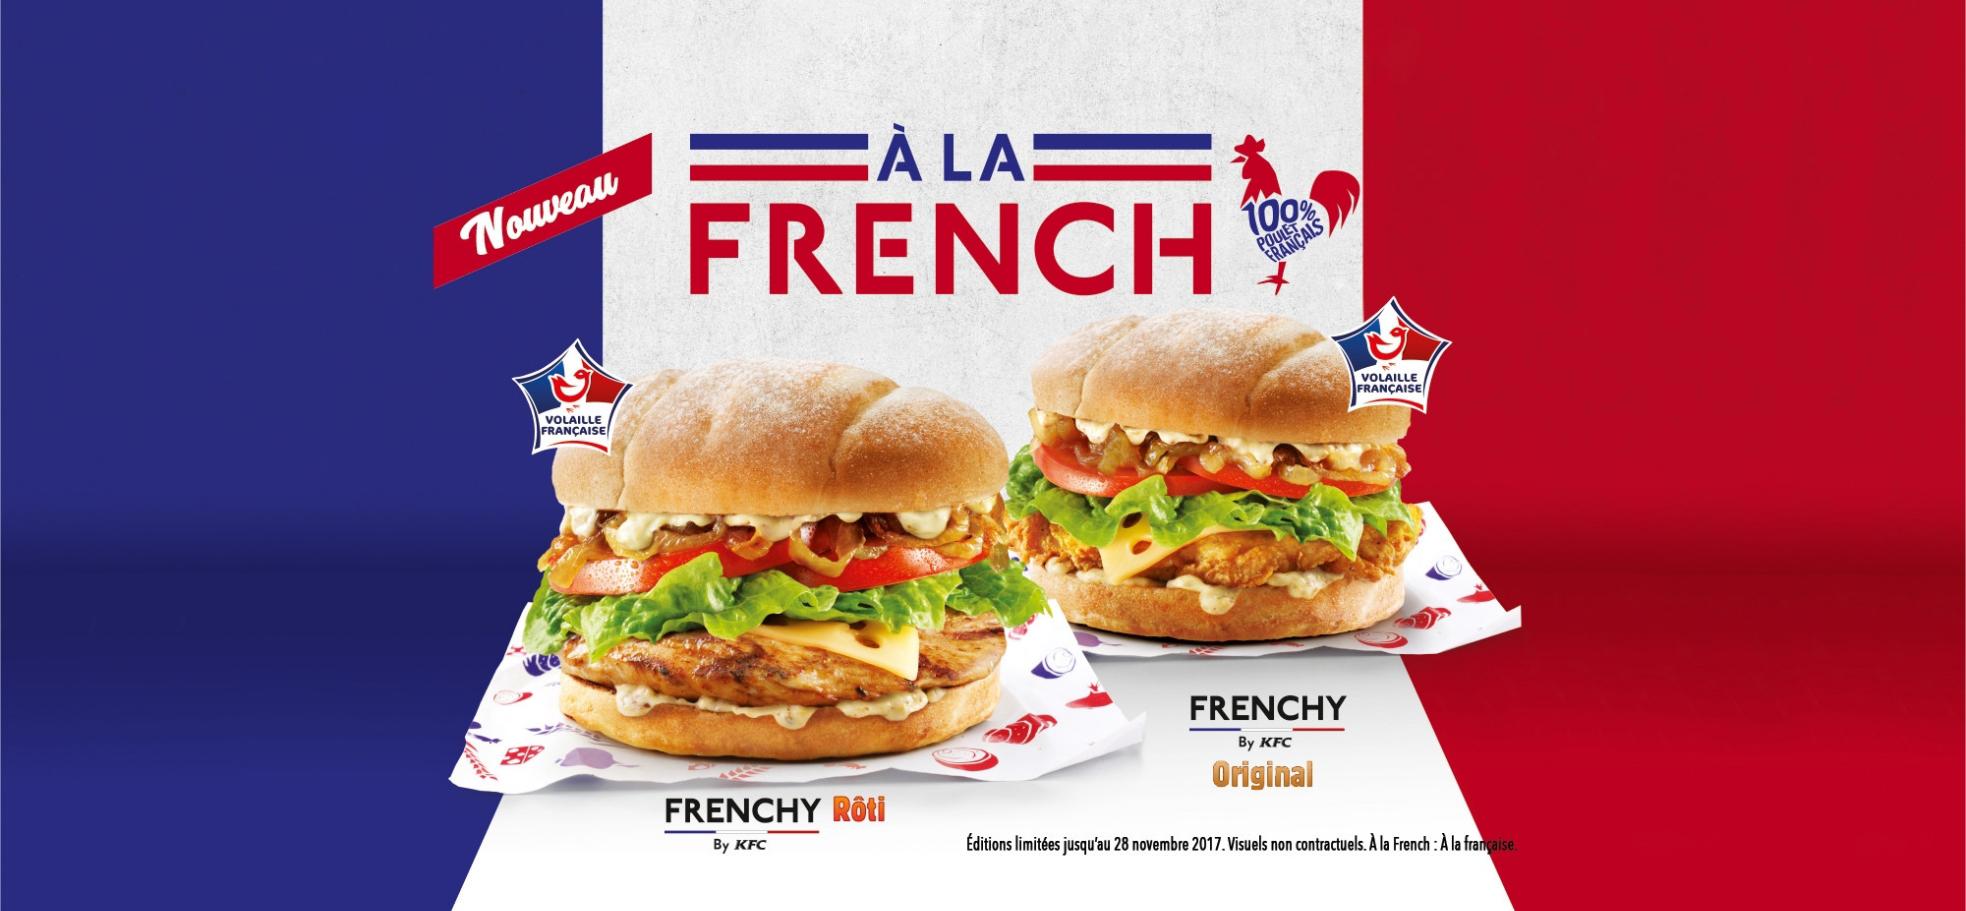 kfc_burger_alafrench